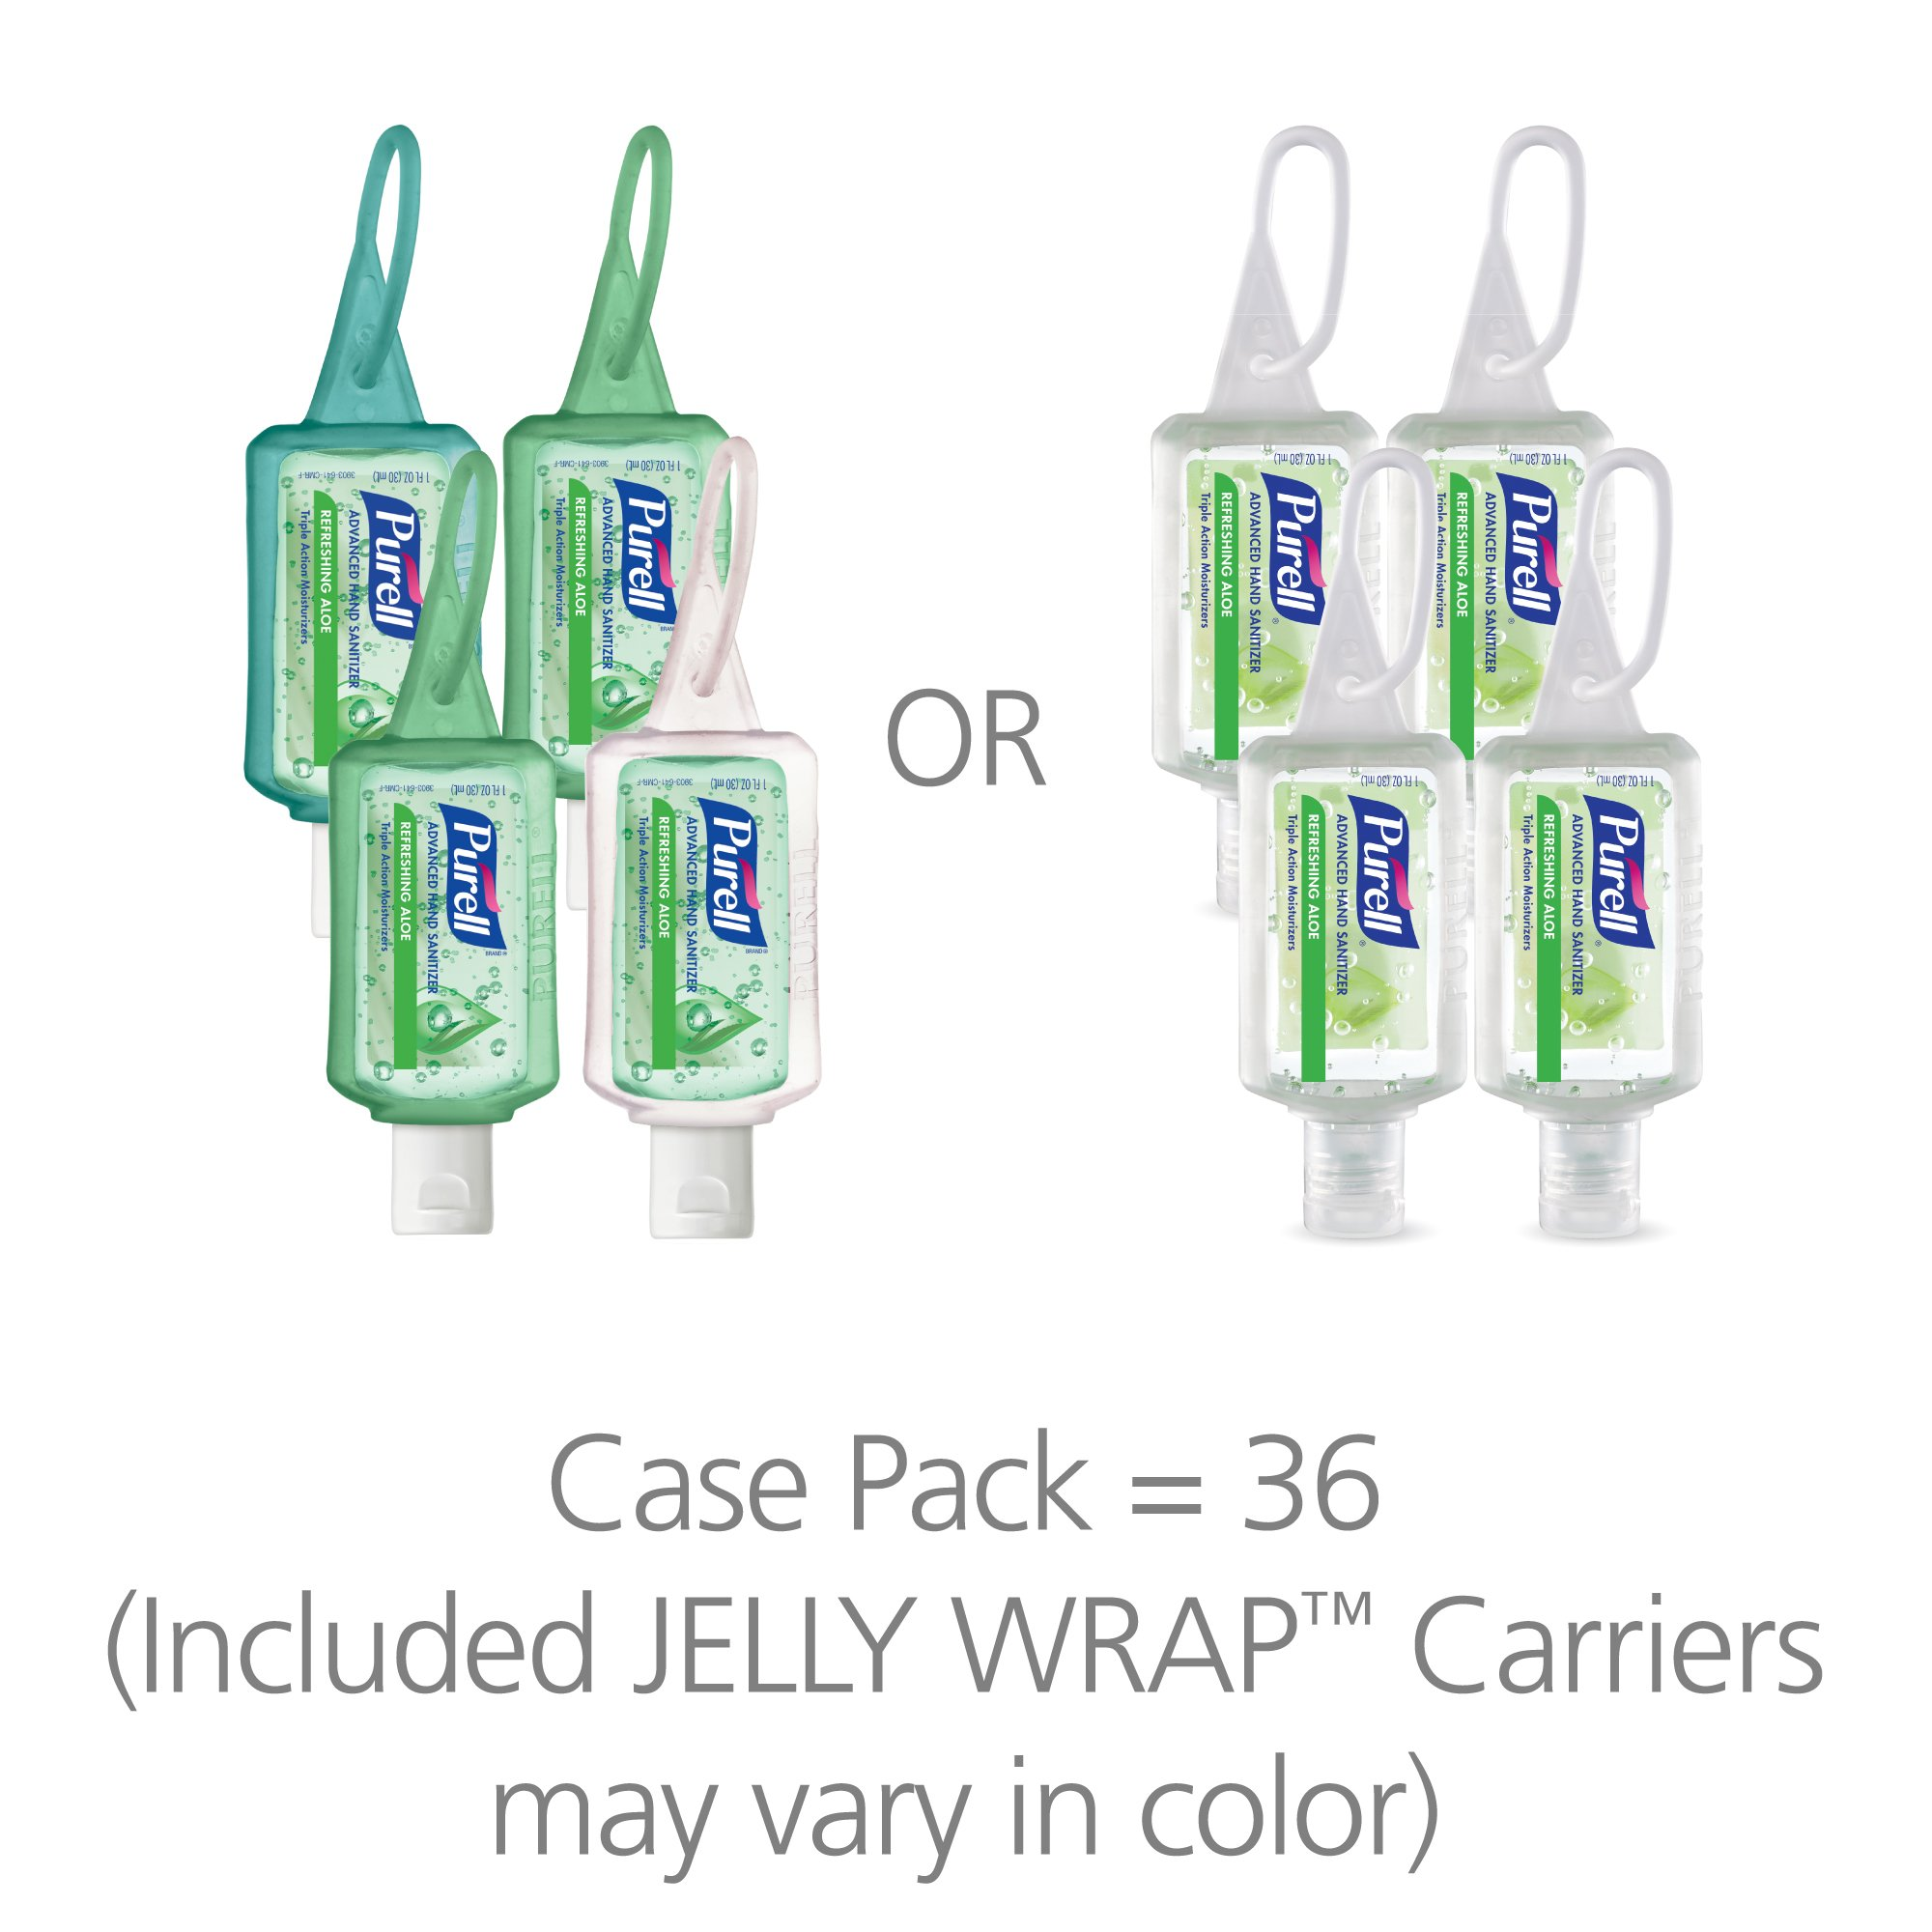 PURELL 3903-36 Advanced Hand Sanitizer Portable Bottles - Hand Sanitizer Gel With Aloe, 1 oz. Travel Sized Jelly Wrap Bottles (Case of 36) -